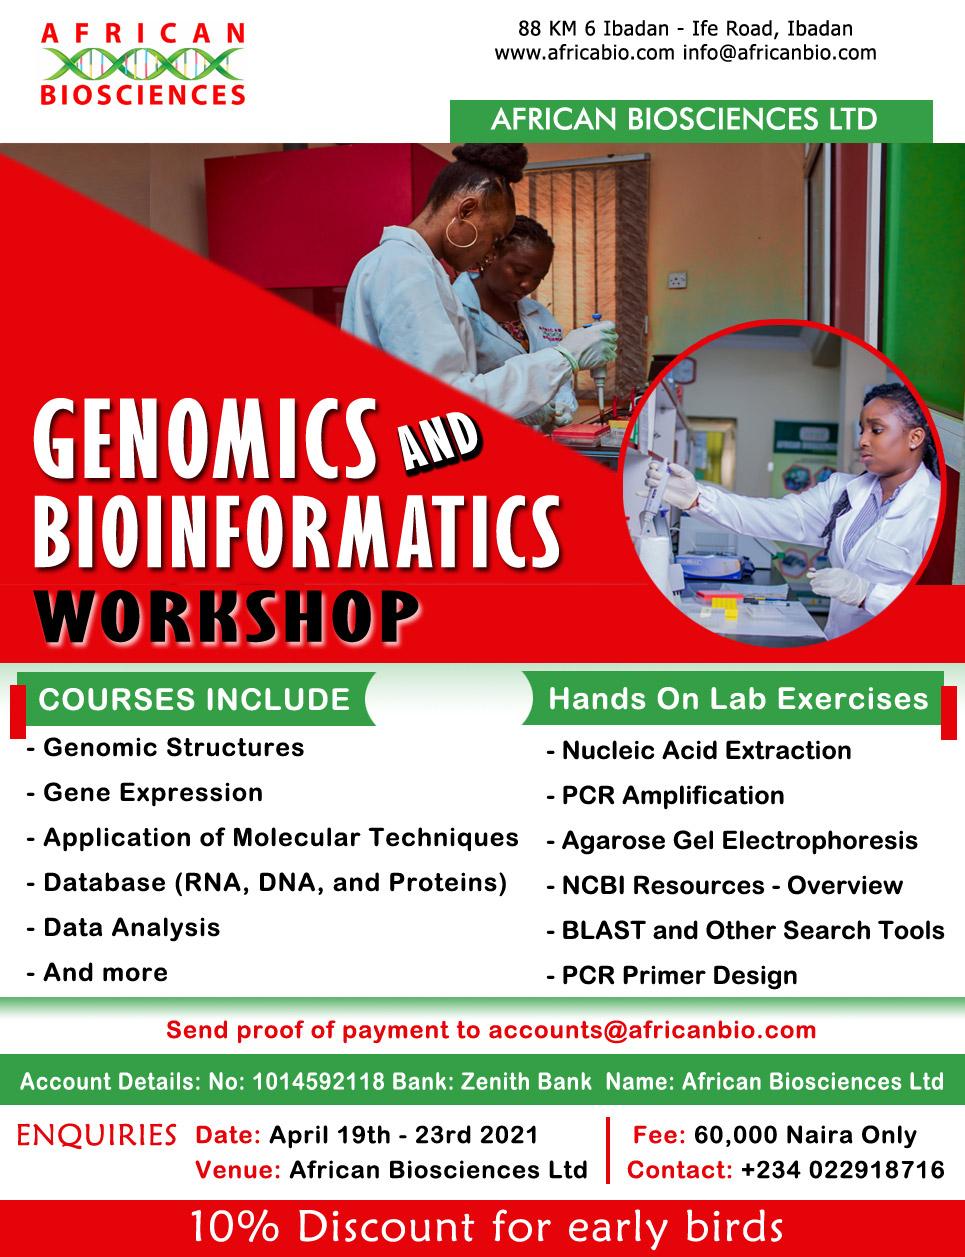 Africanbio Genomics Bioinformatics